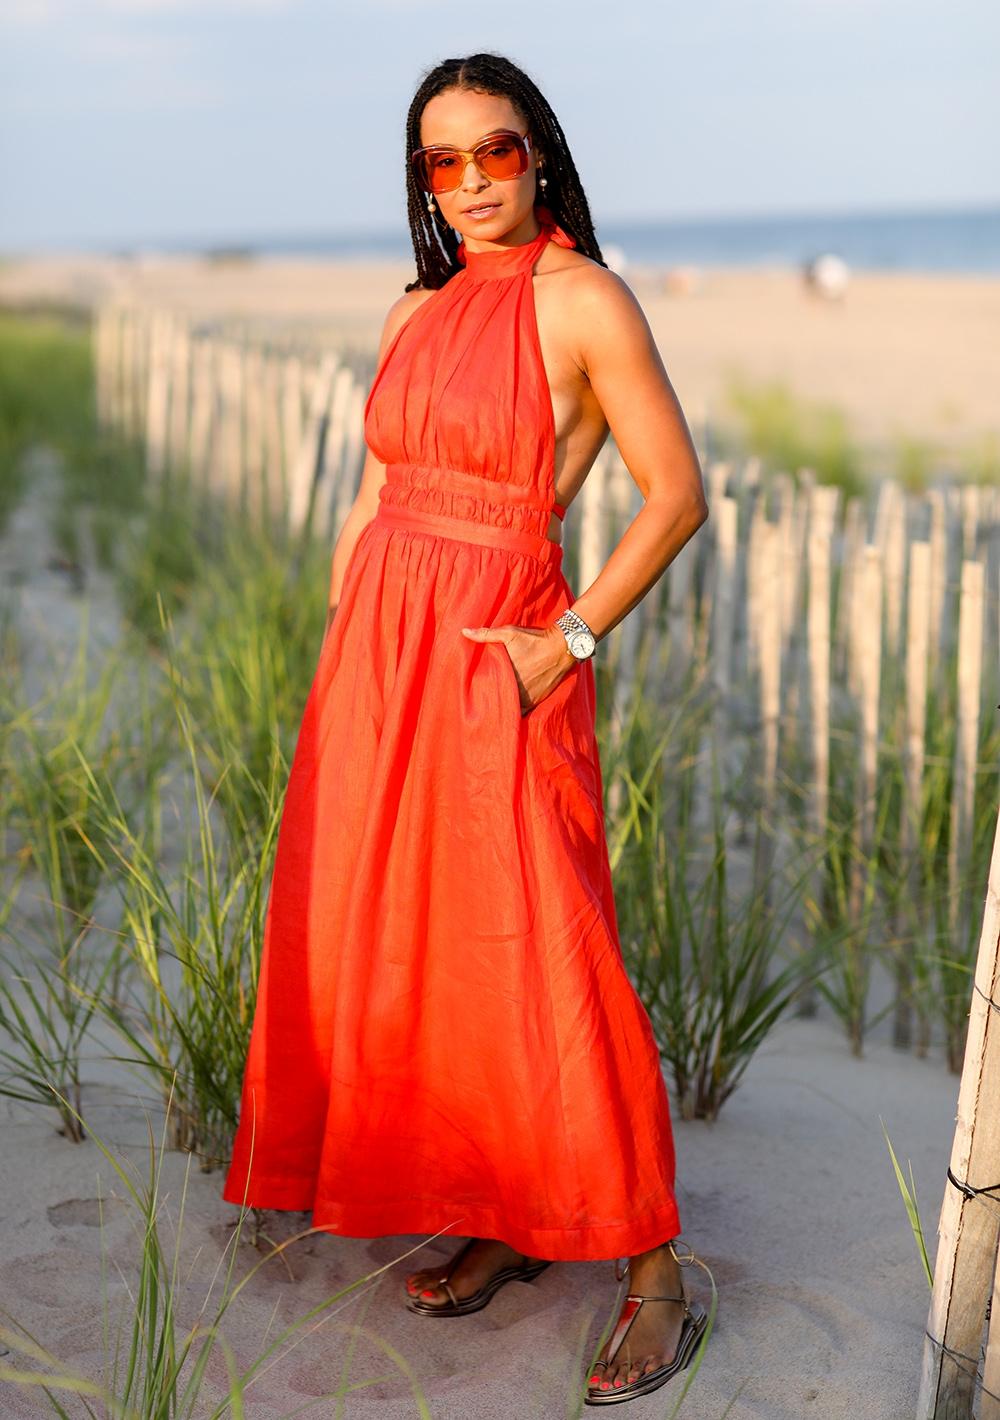 Sai De Silva in the Hamptons with Zimmermann